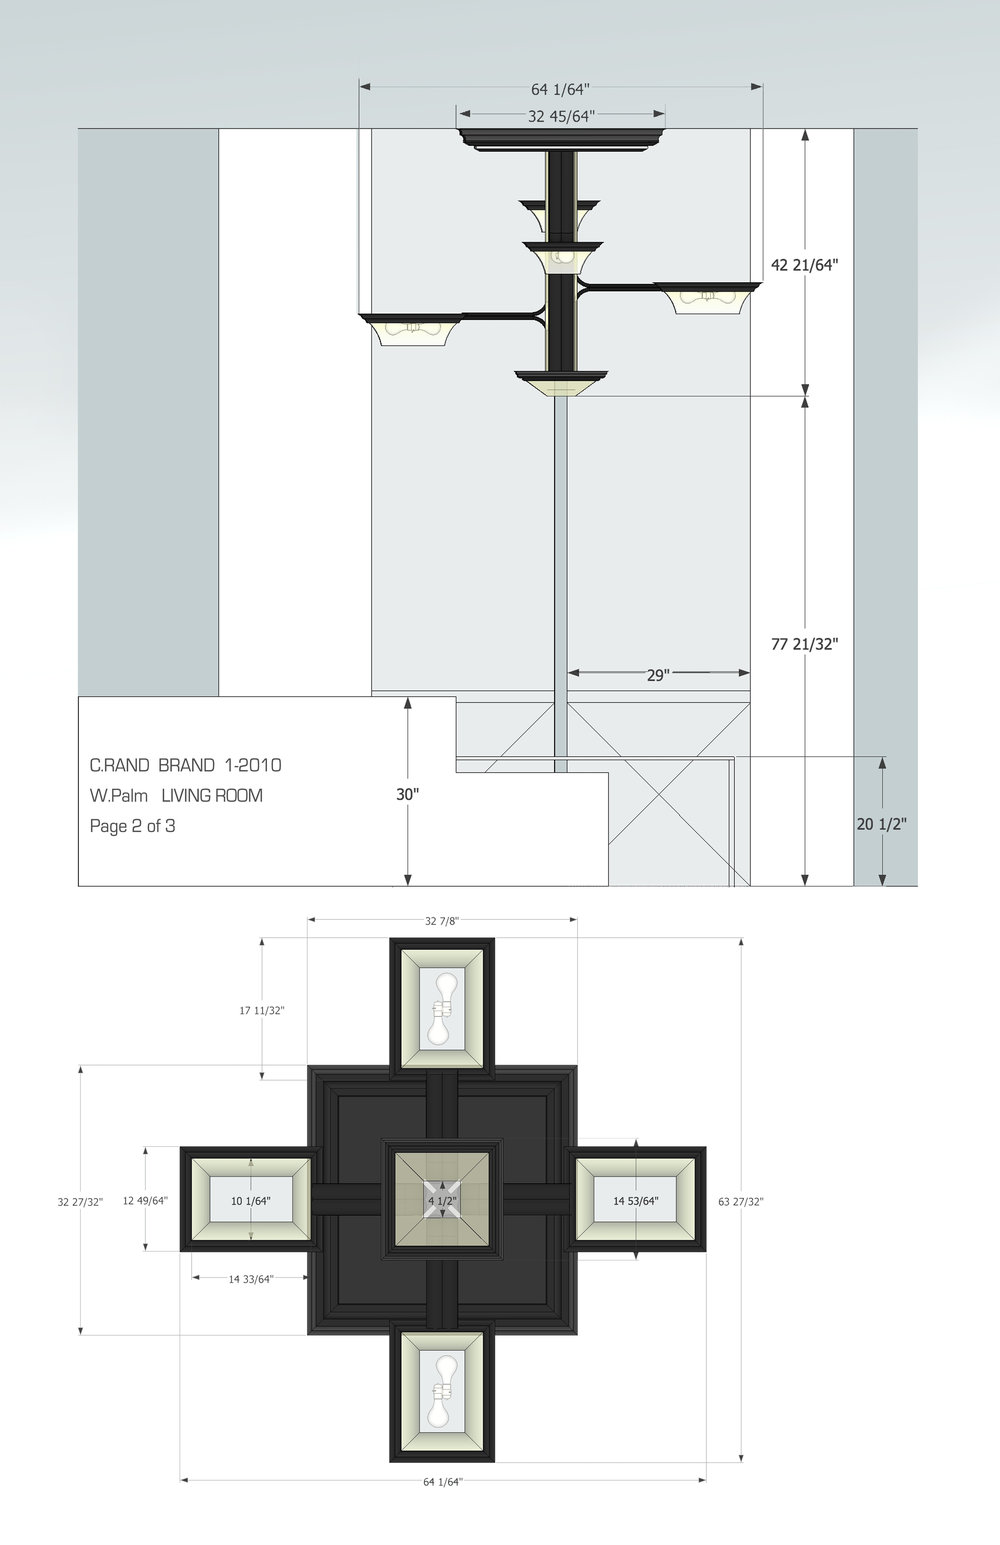 livingroom2.draw.page.jpg